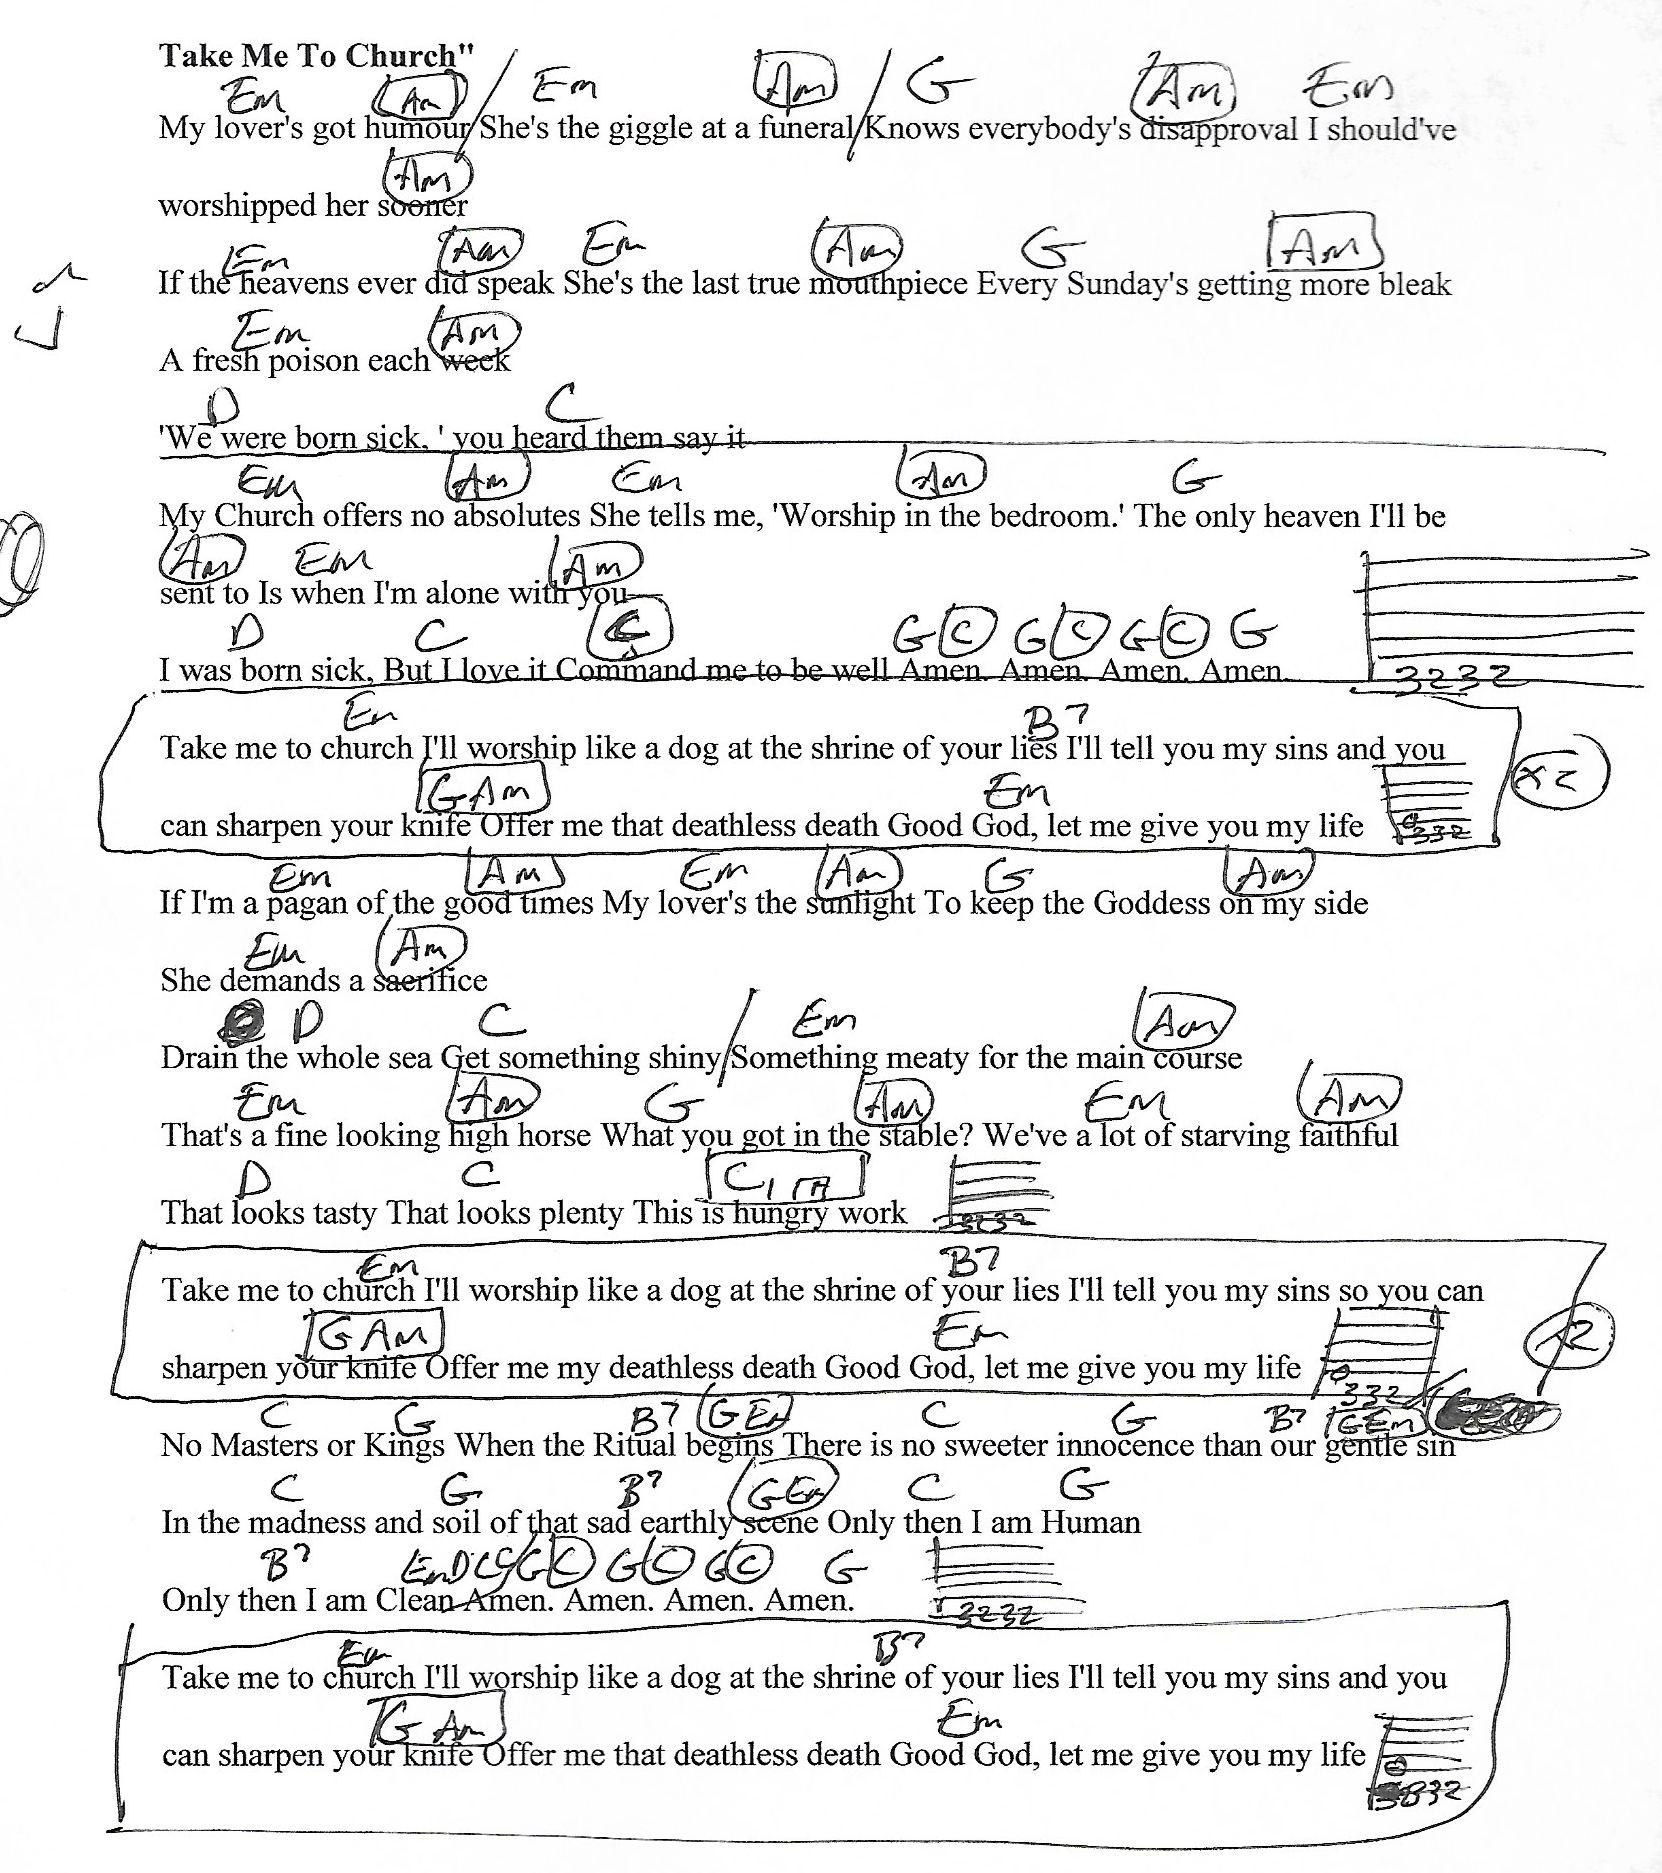 Take me to church hozier guitar chord chart with lyrics http take me to church hozier guitar chord chart with lyrics http hexwebz Images